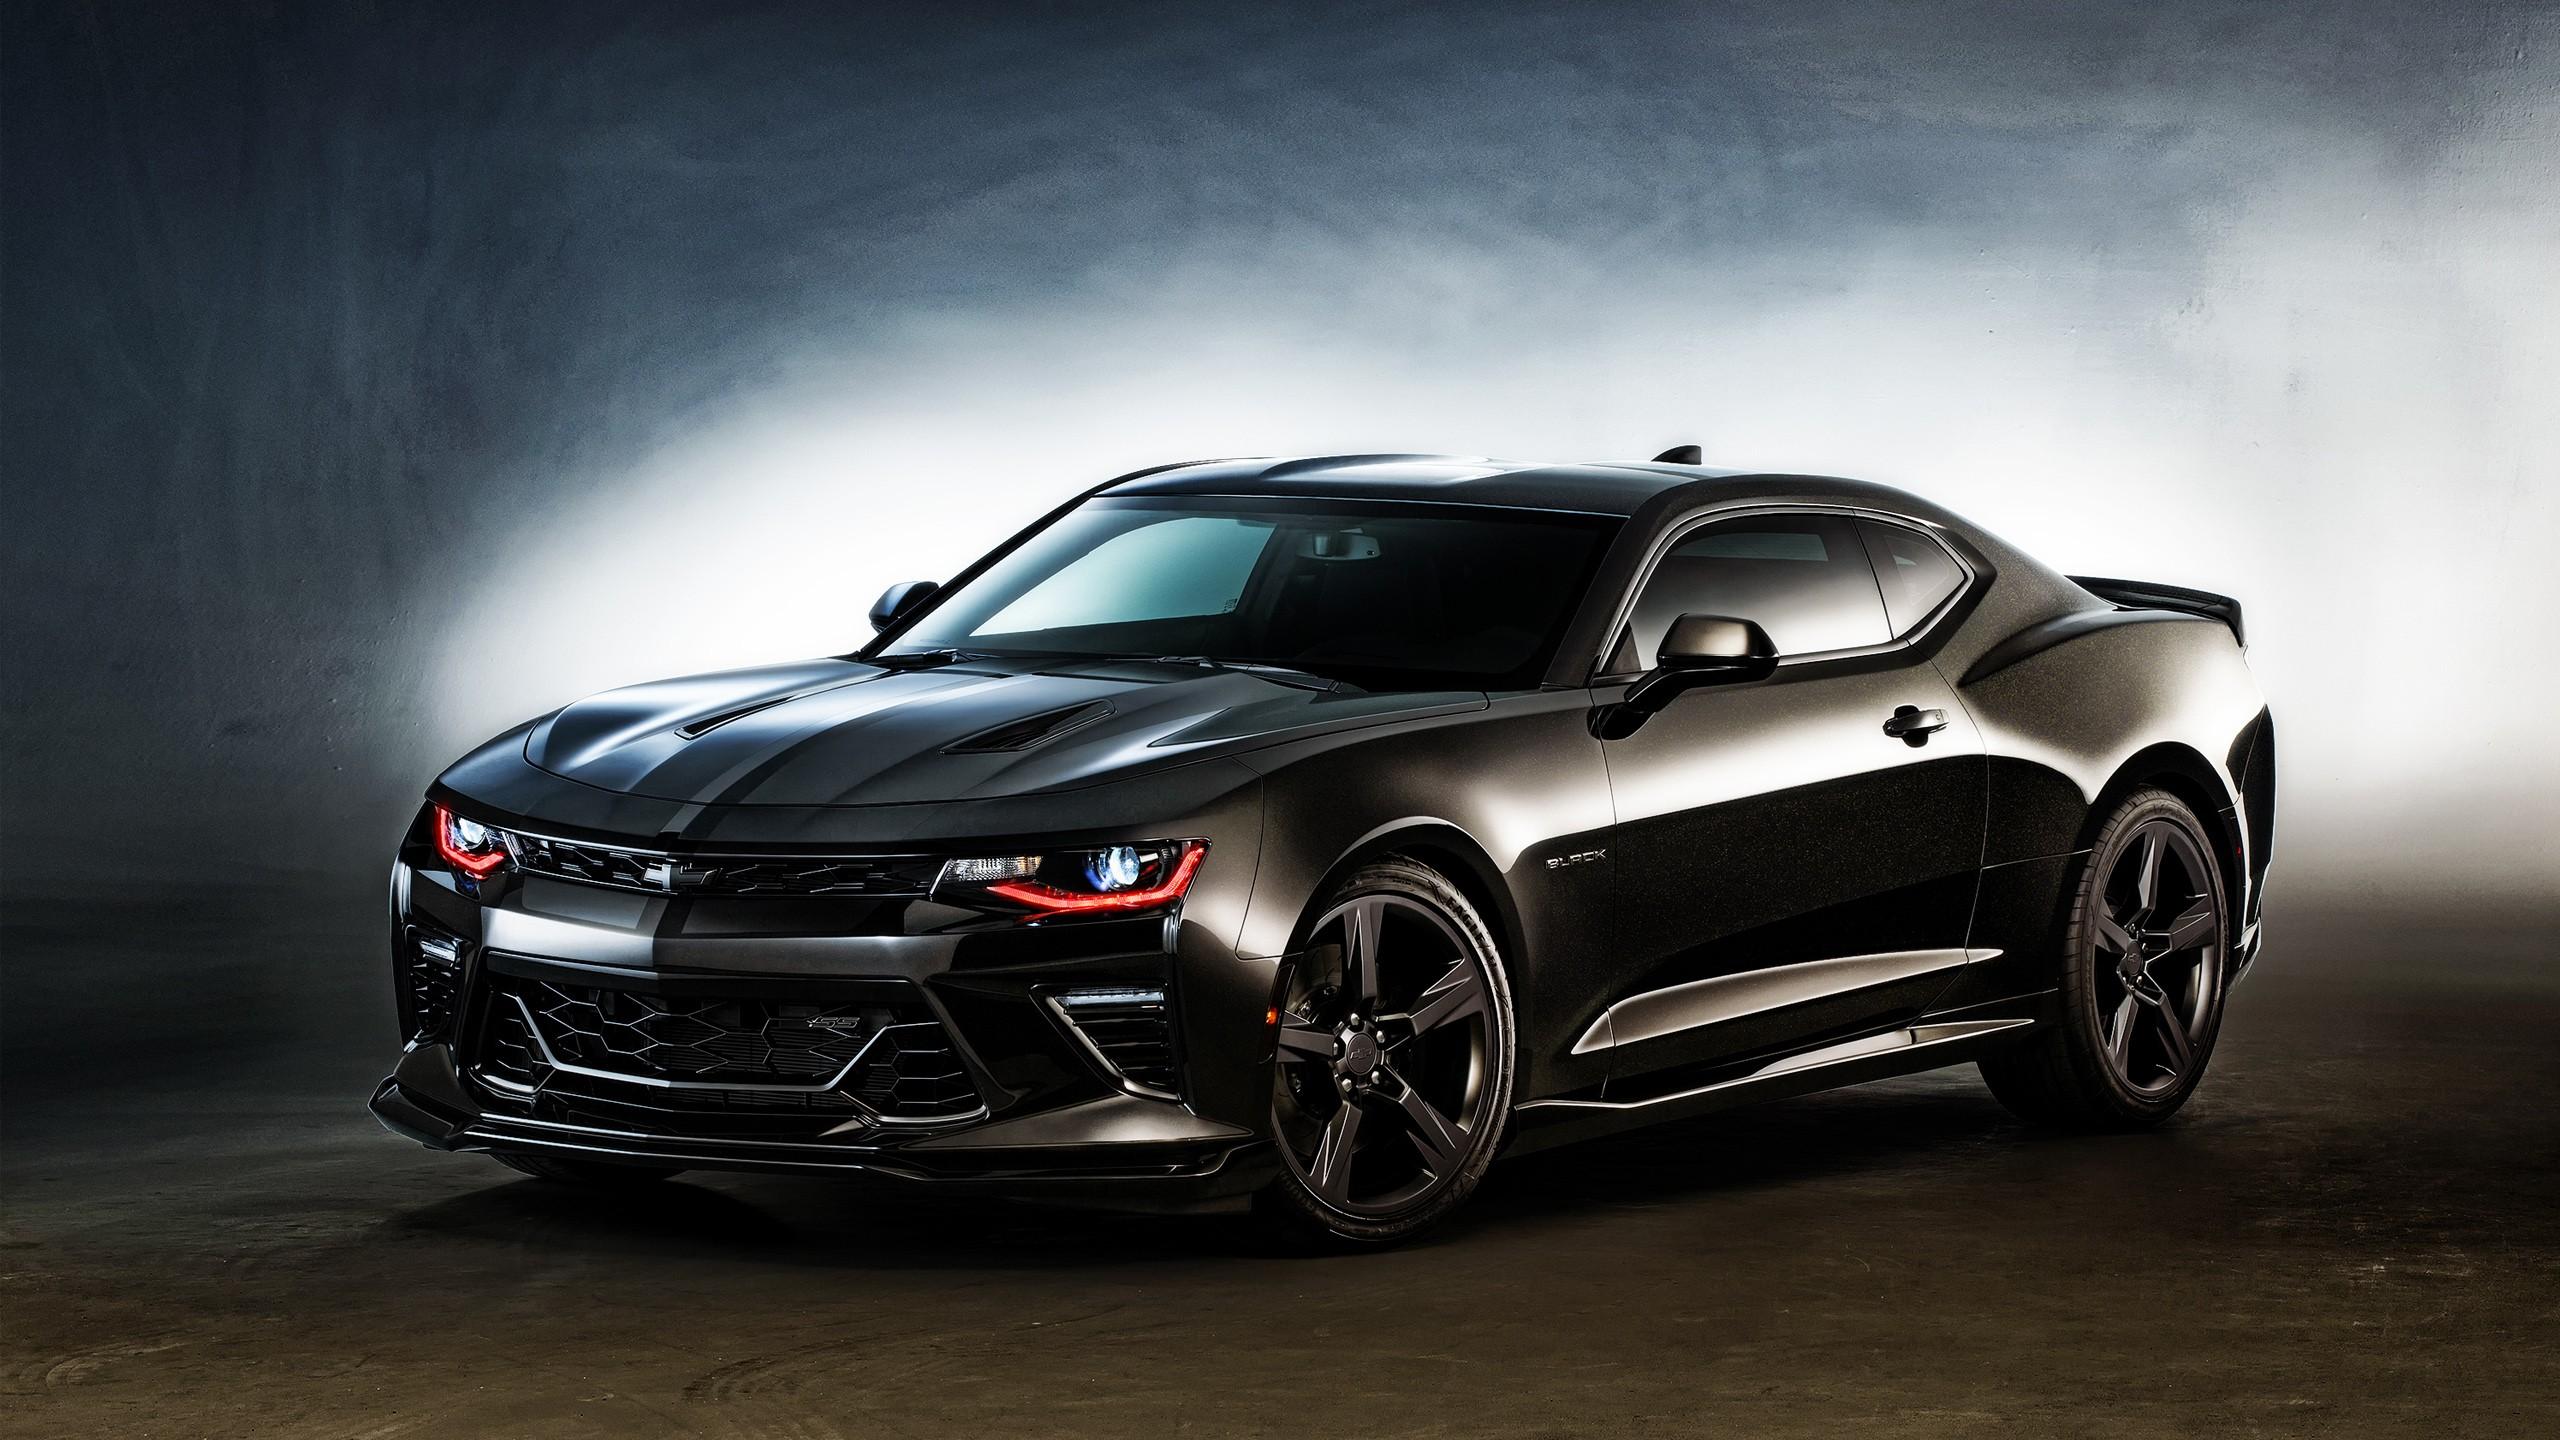 2016 Chevrolet Camaro Black Wallpaper | HD Car Wallpapers ...